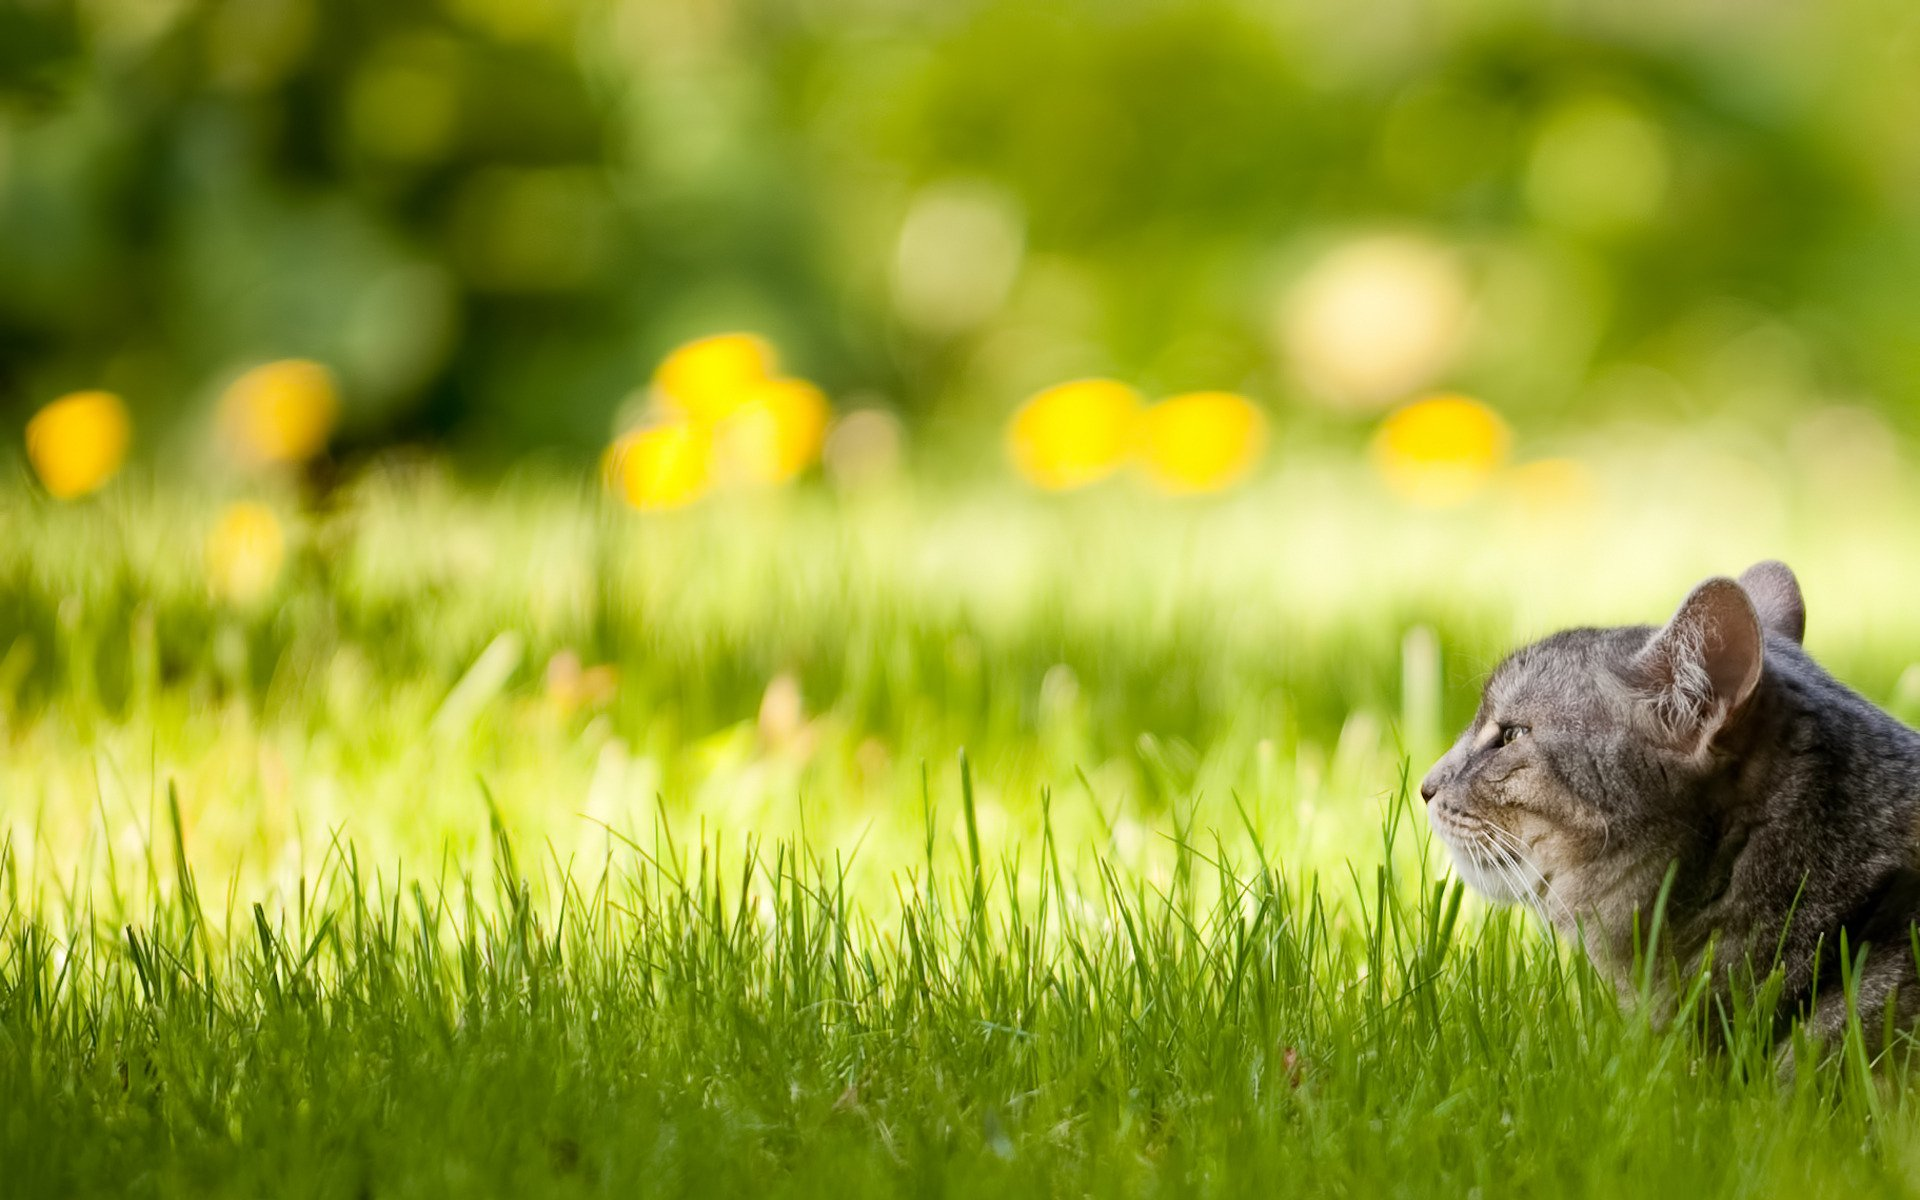 Котенок в траве  № 2954095 без смс